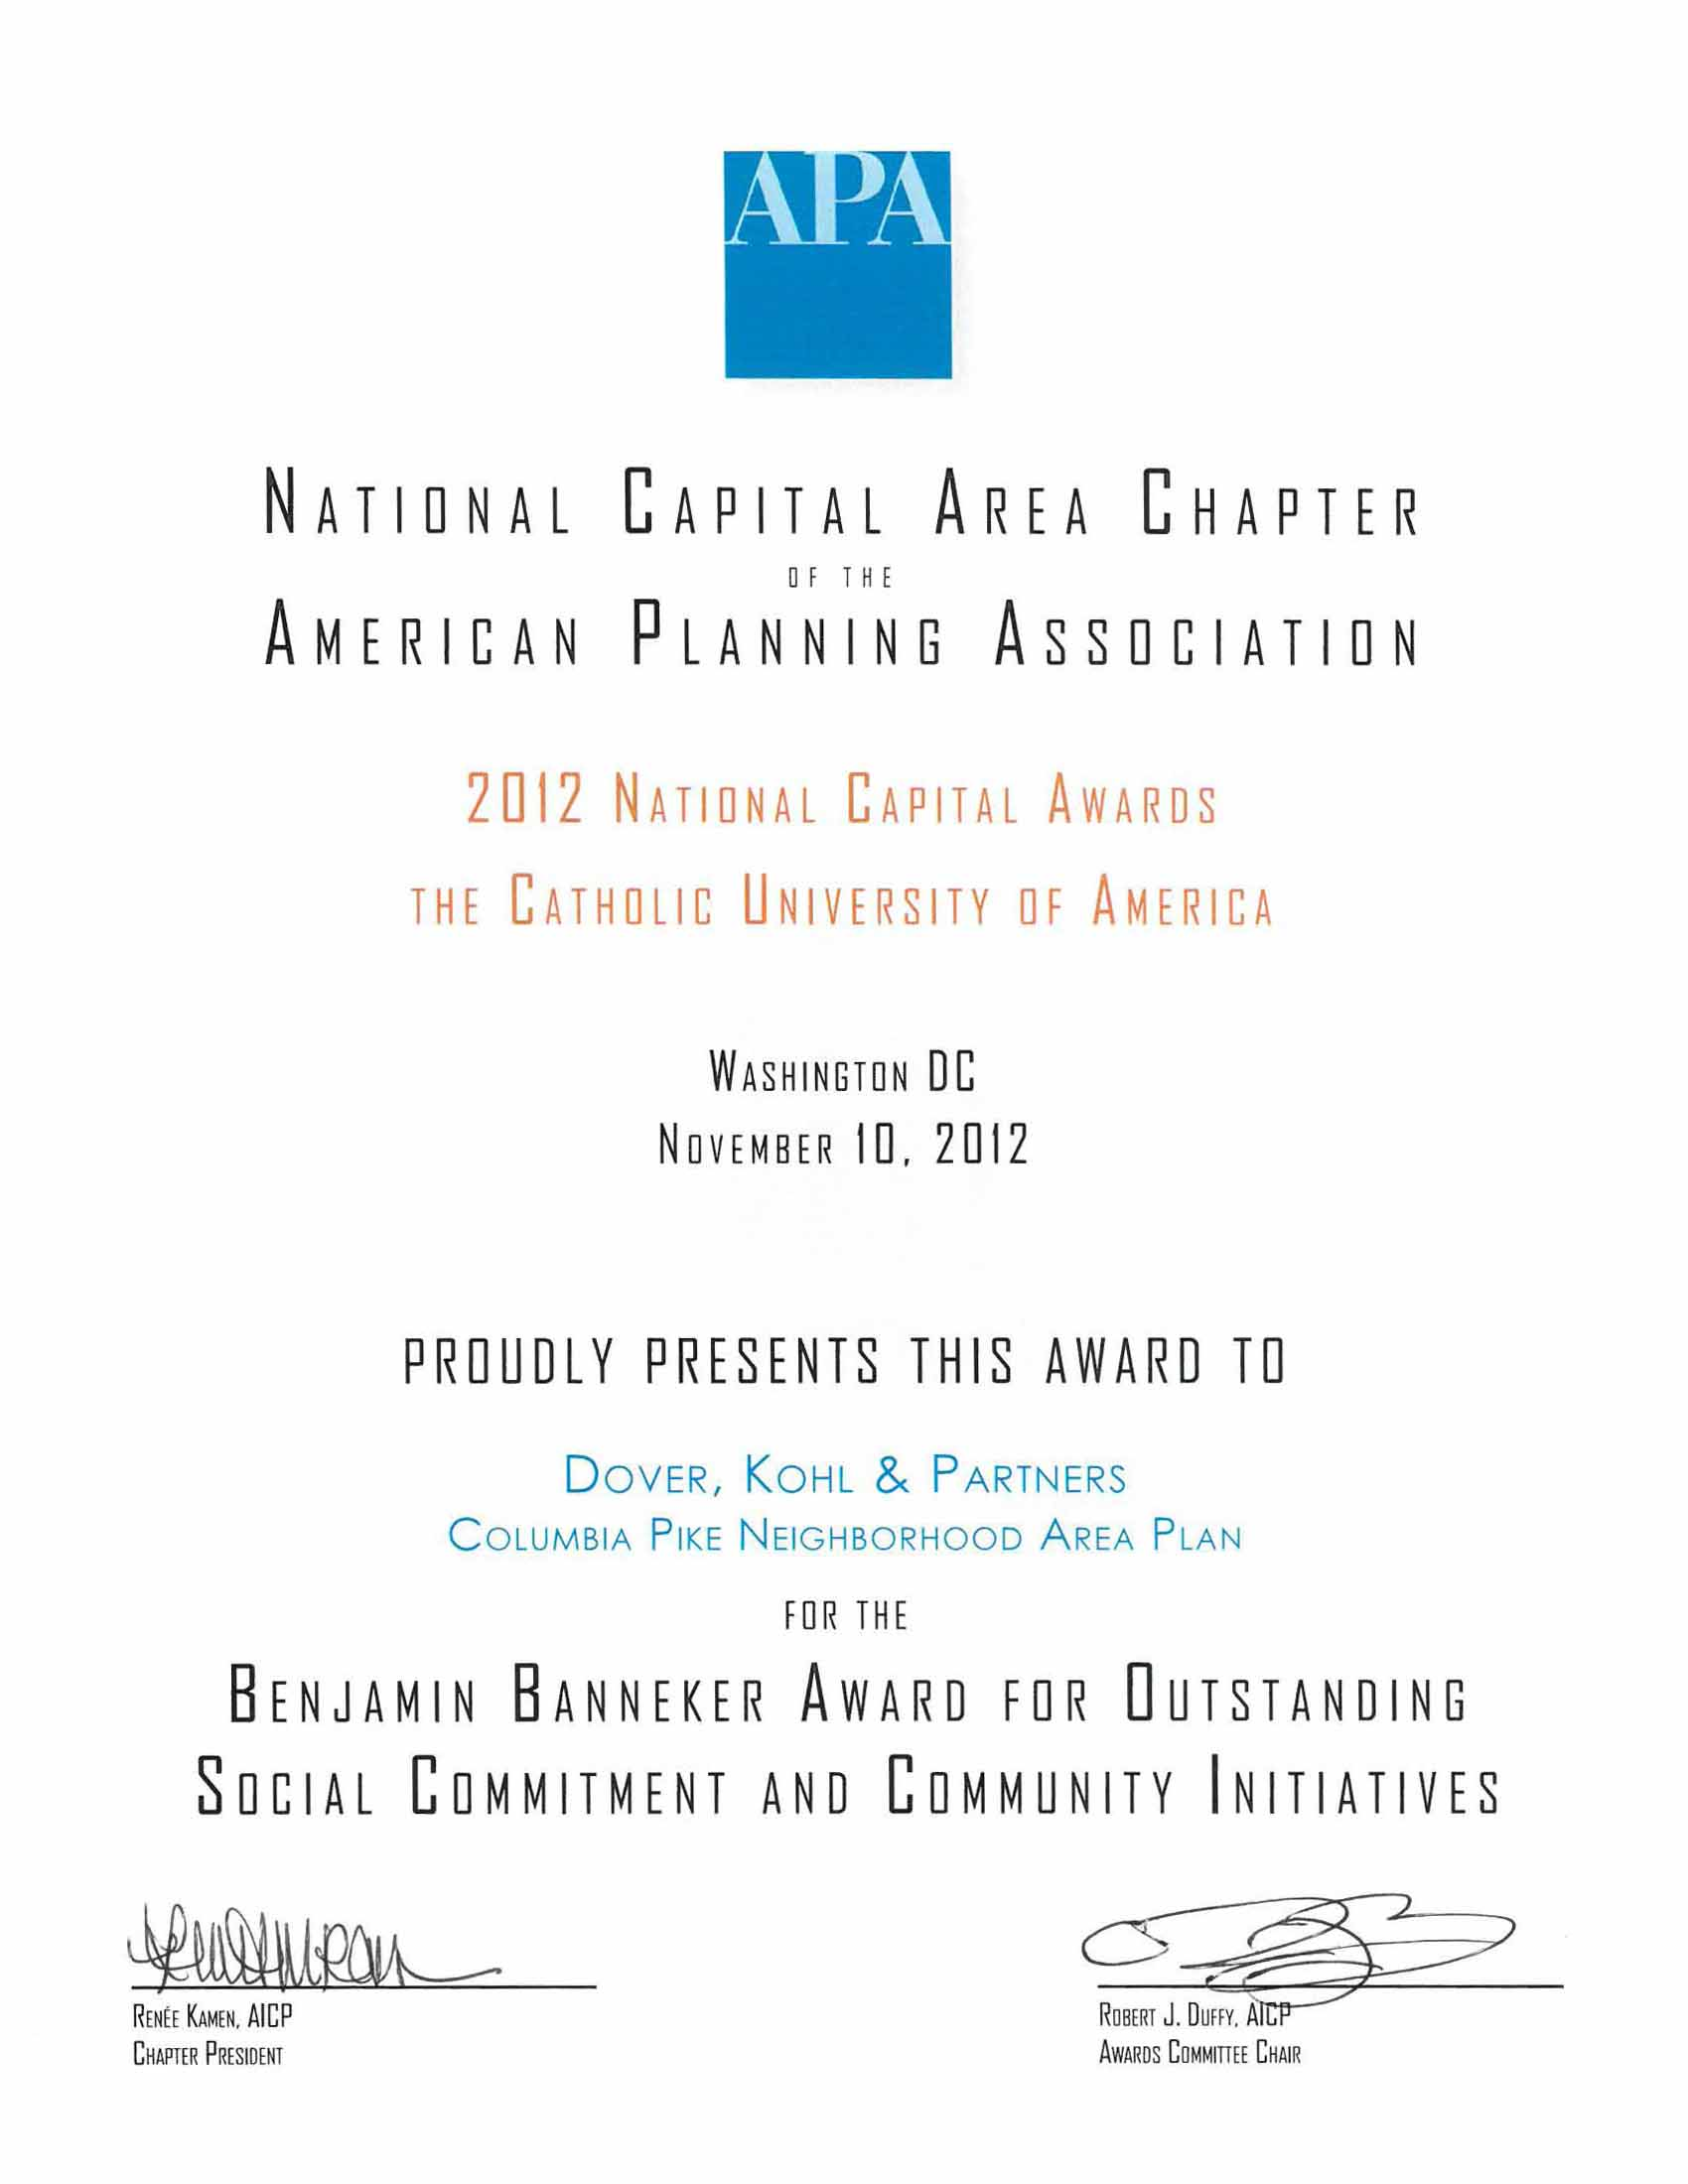 2012-APA-NC- Catholic University Of Ammerica- Benjamin Bannerker- Outstanding Social commitment and communityinitiatives.jpg